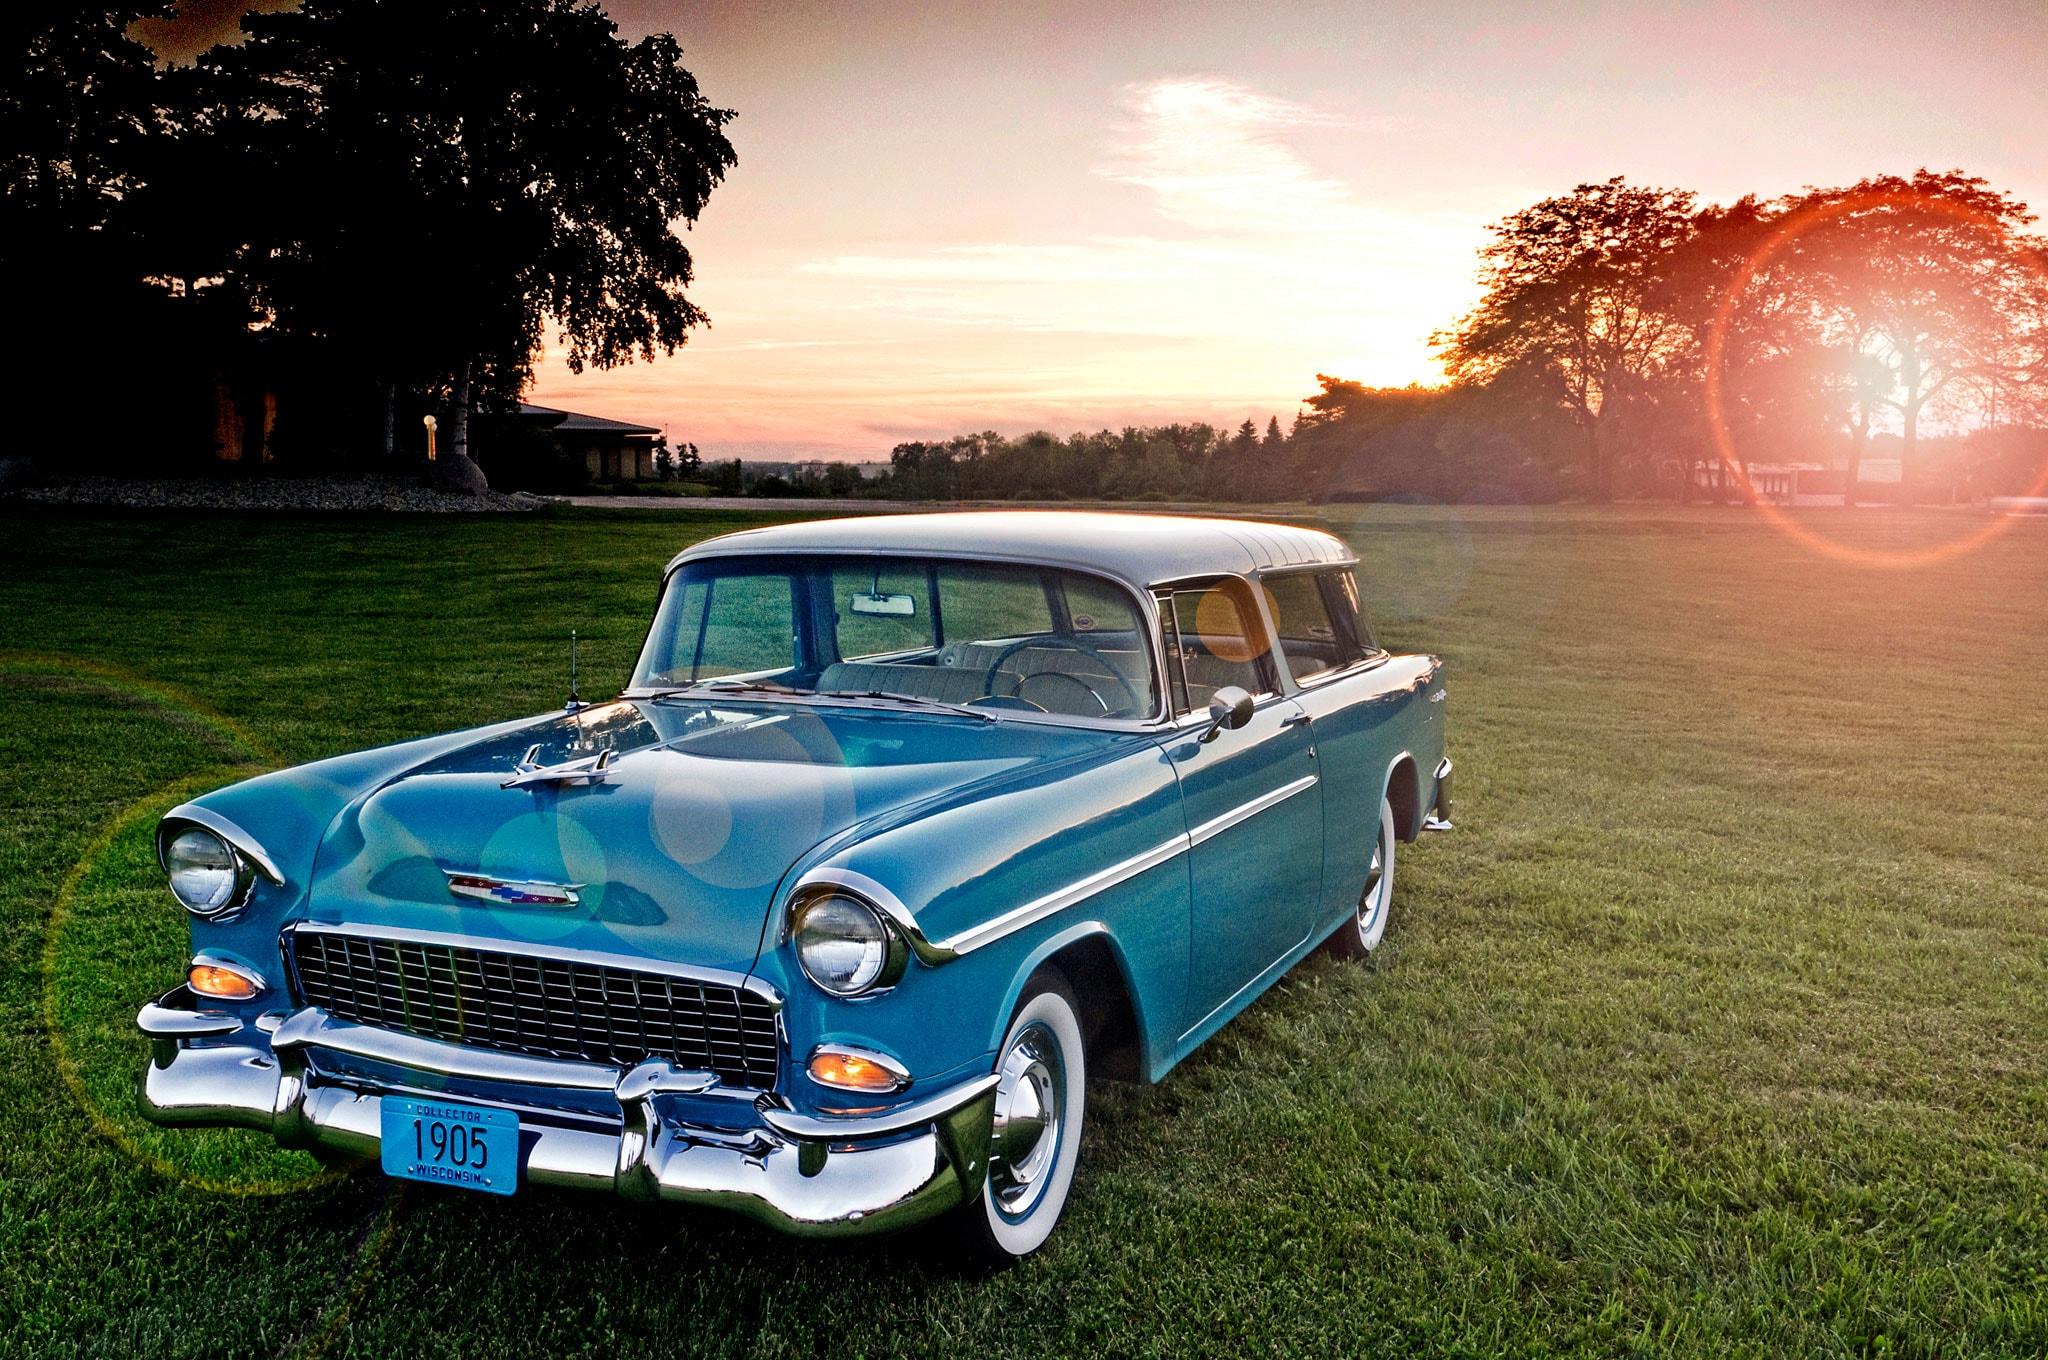 1955 Chevrolet Nomad High